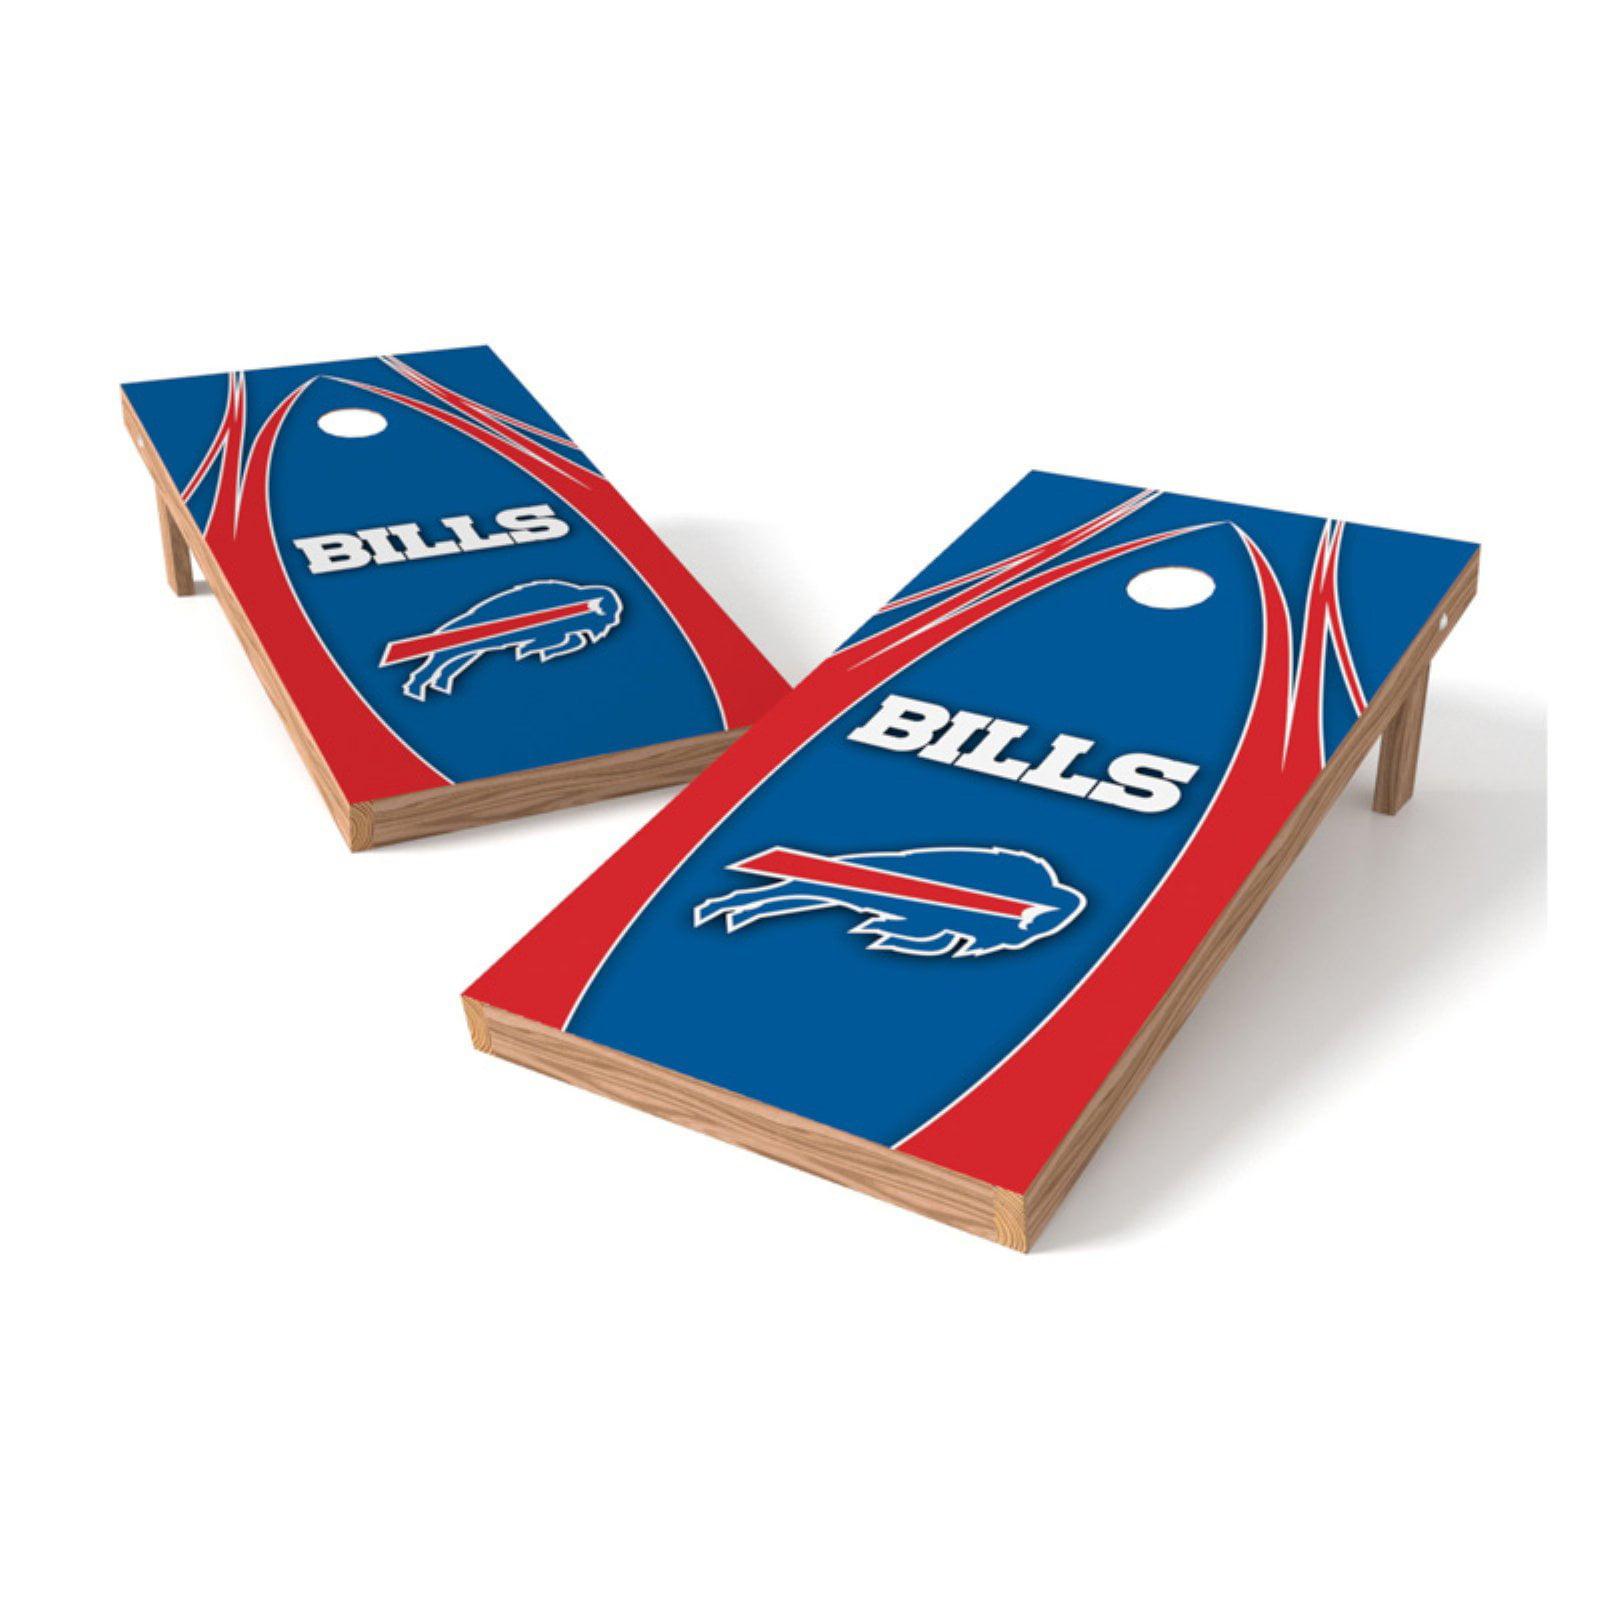 BUFFALO BILLS Cornhole Bean Bags 4 ACA Regulation Corn Toss Tailgate Game Bags